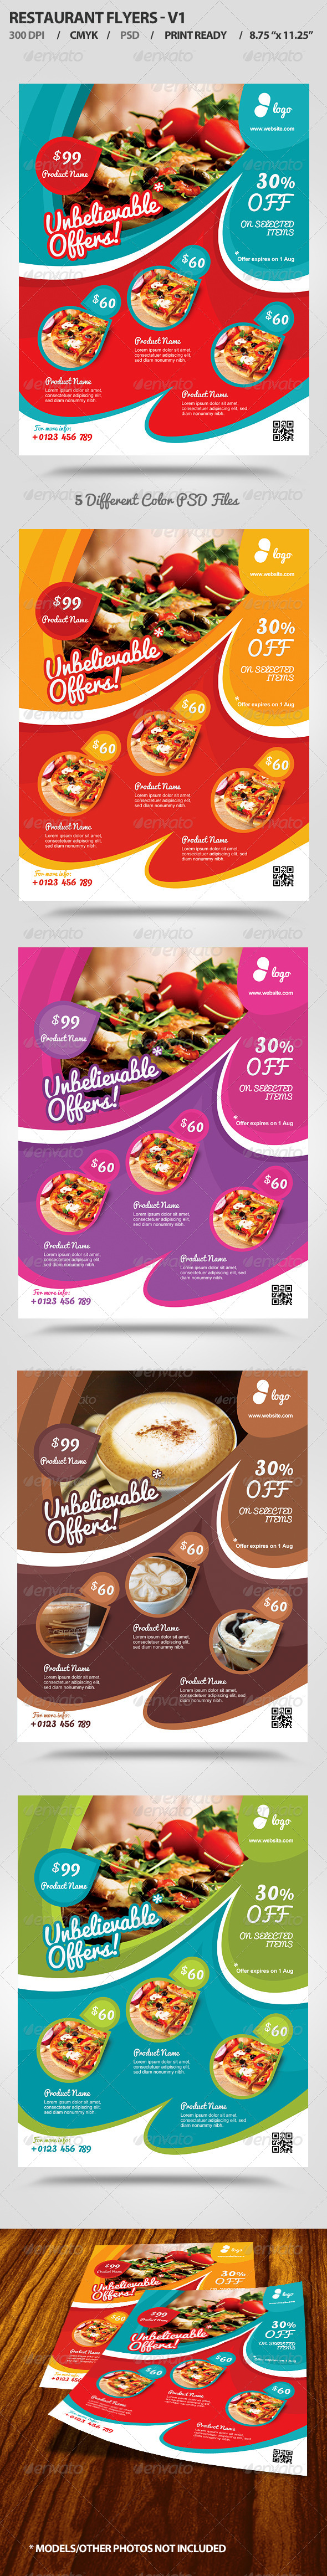 GraphicRiver Restaurant Flyer v1 5030465